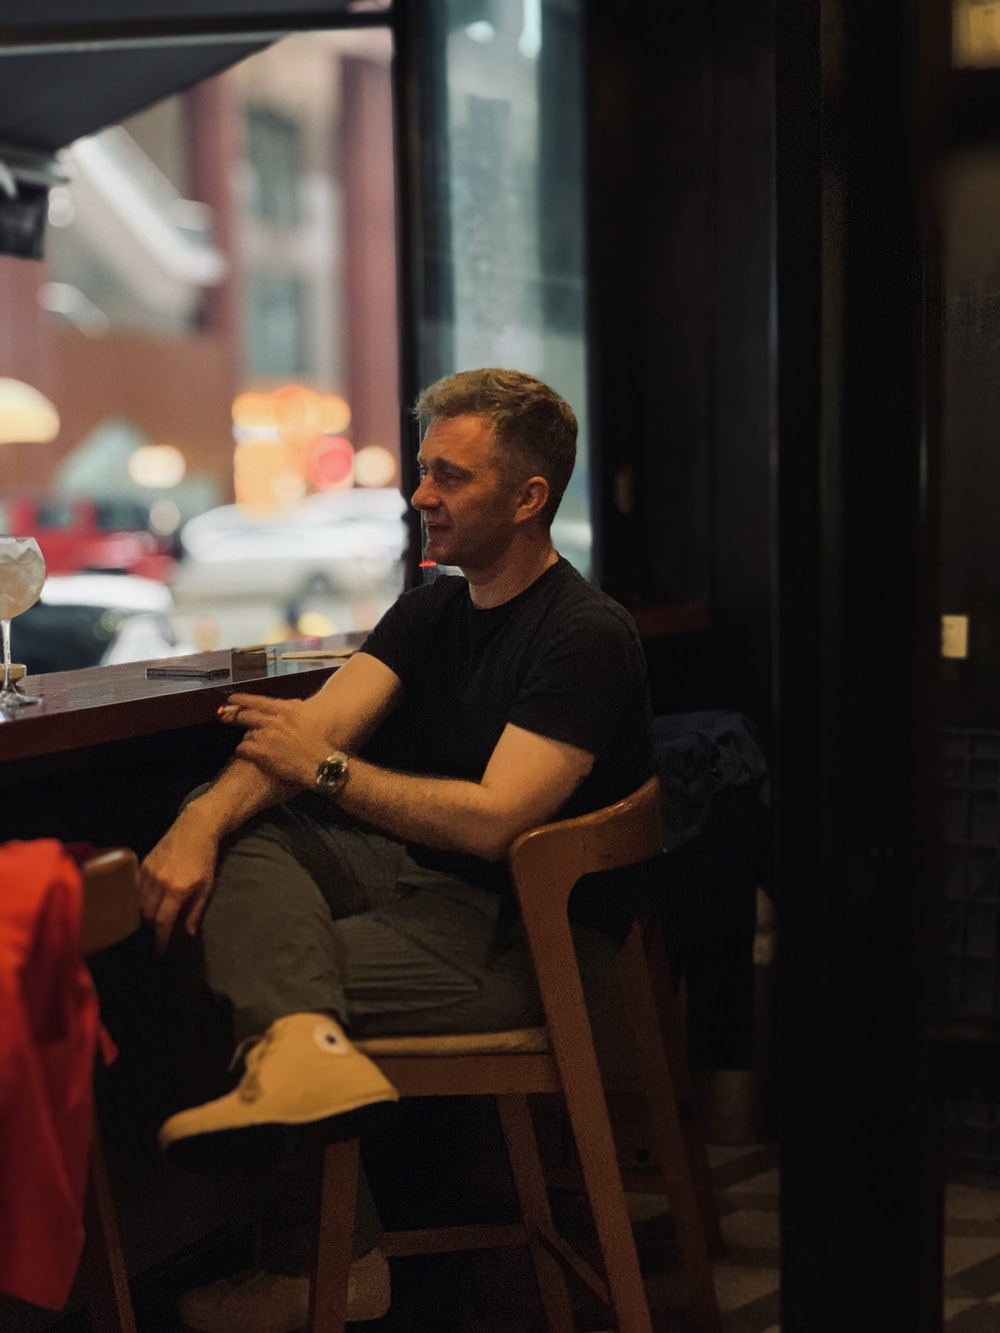 man sitting on bar chair beside counter